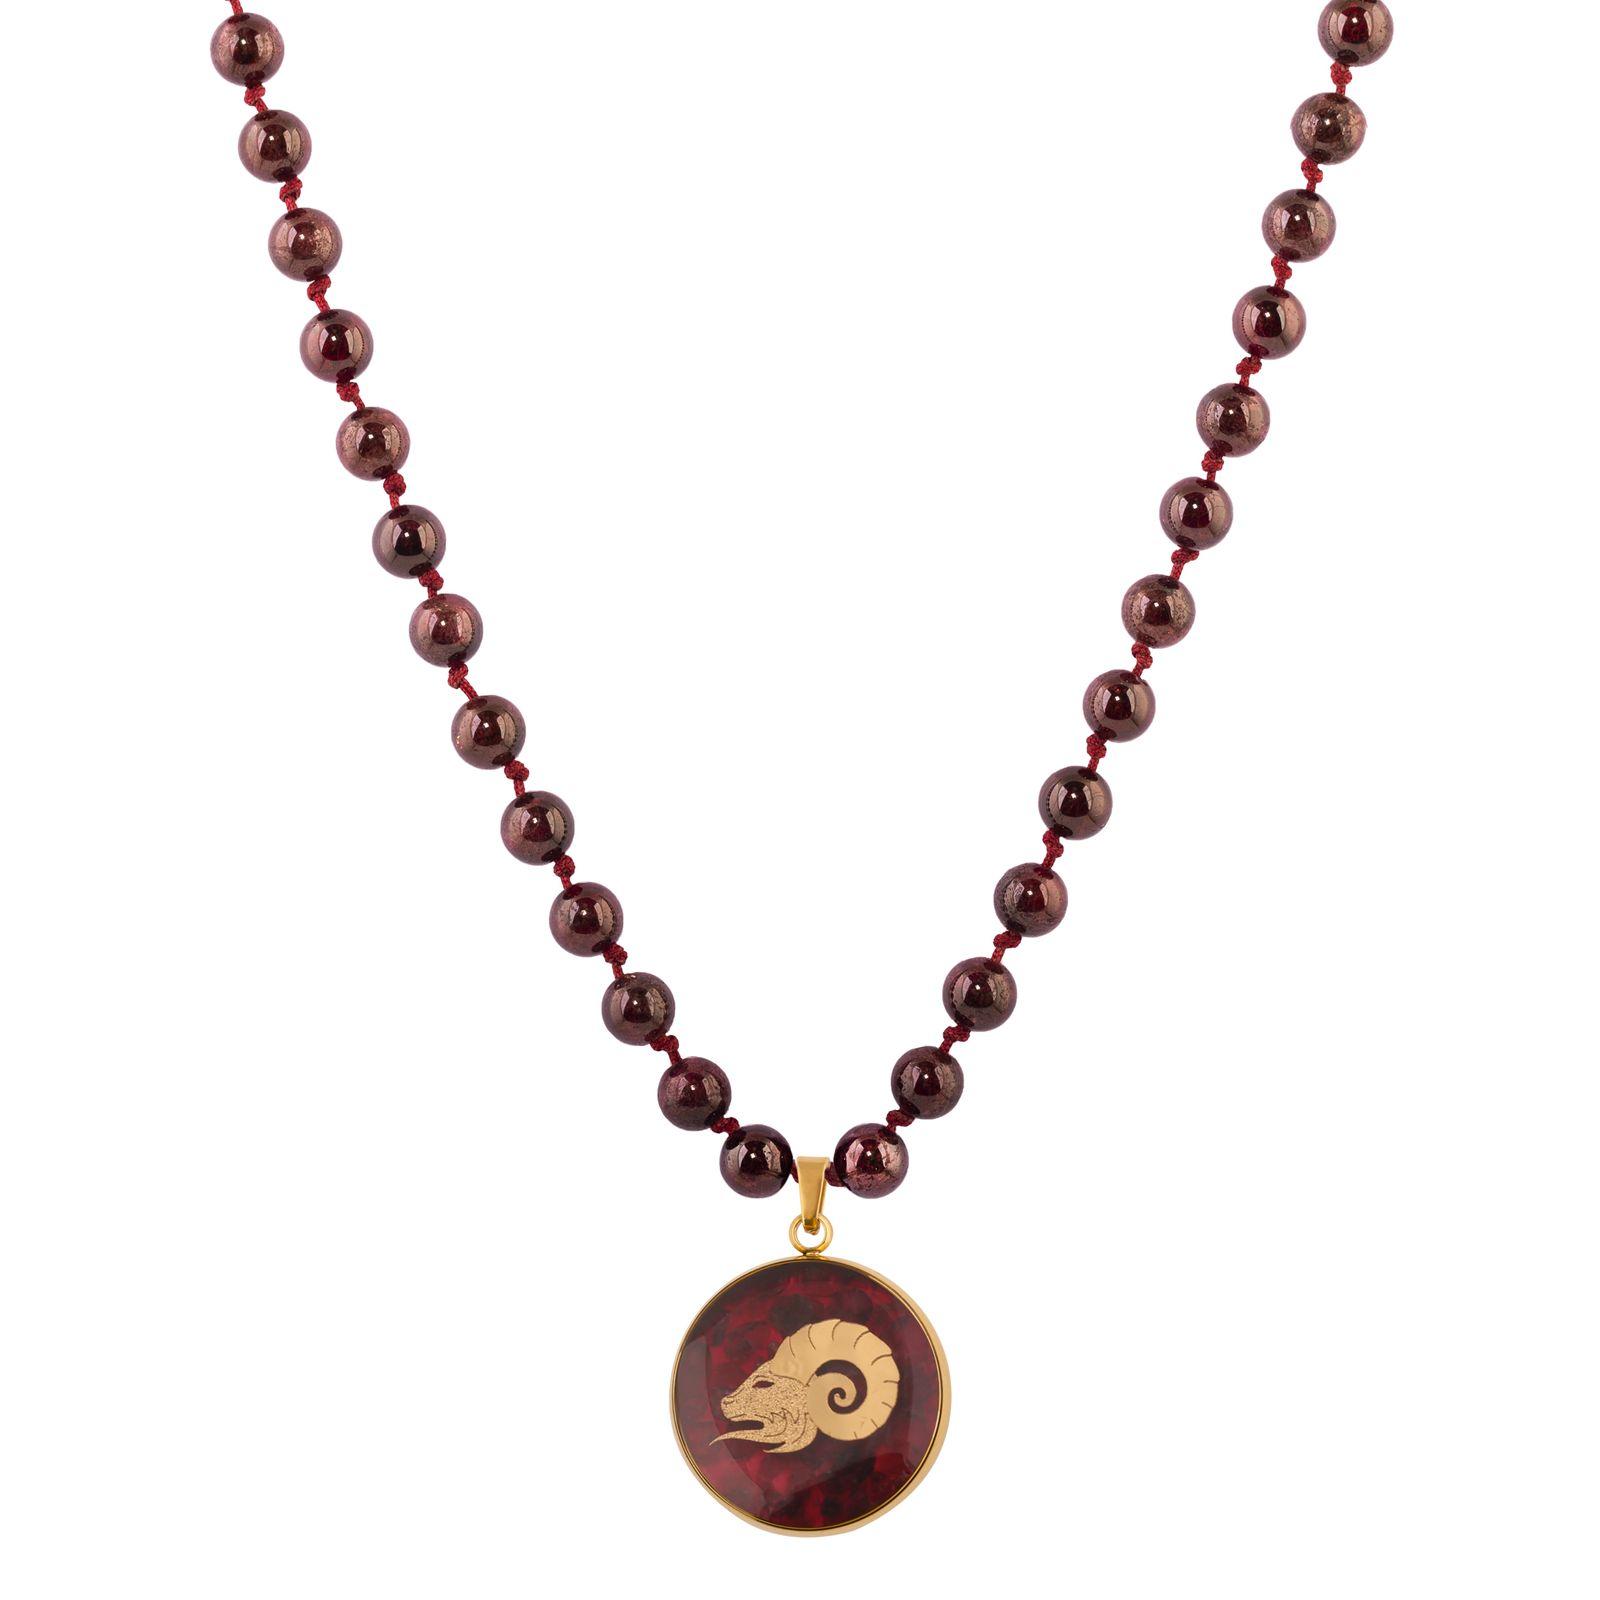 گردنبند زنانه الون طرح نماد ماه فروردین کد GAR102 -  - 2